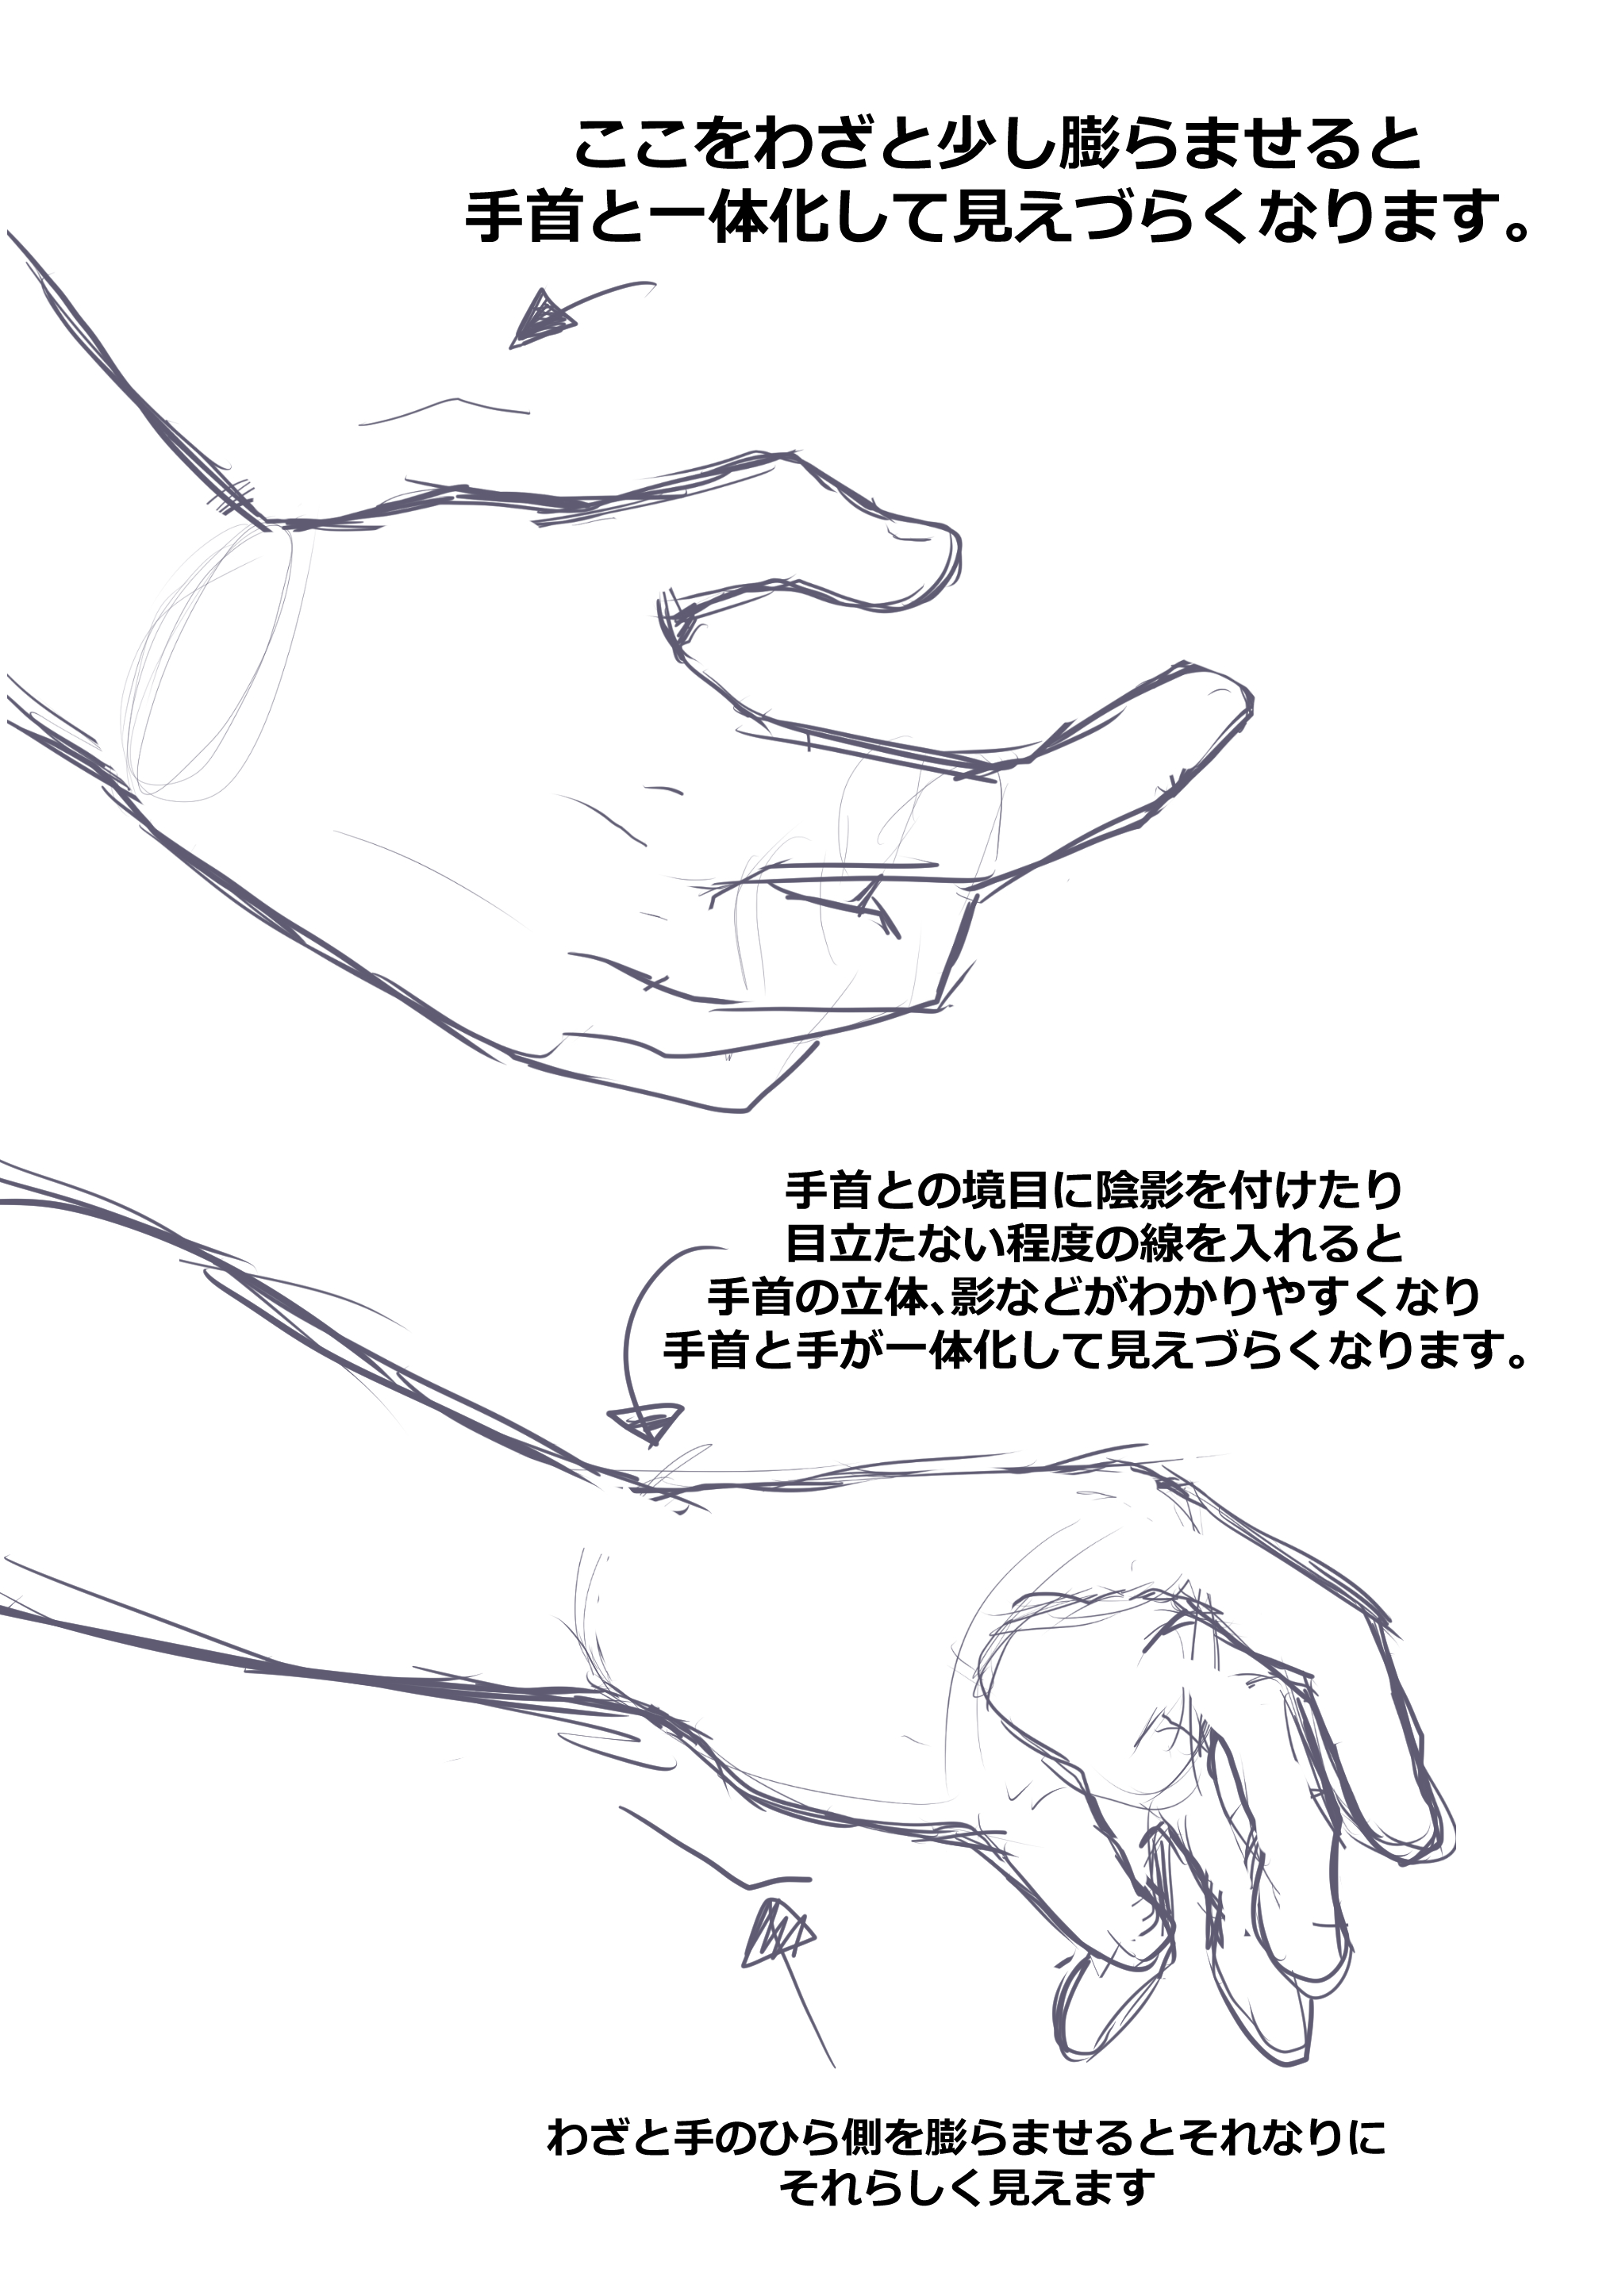 sahbxO2l_02.jpg